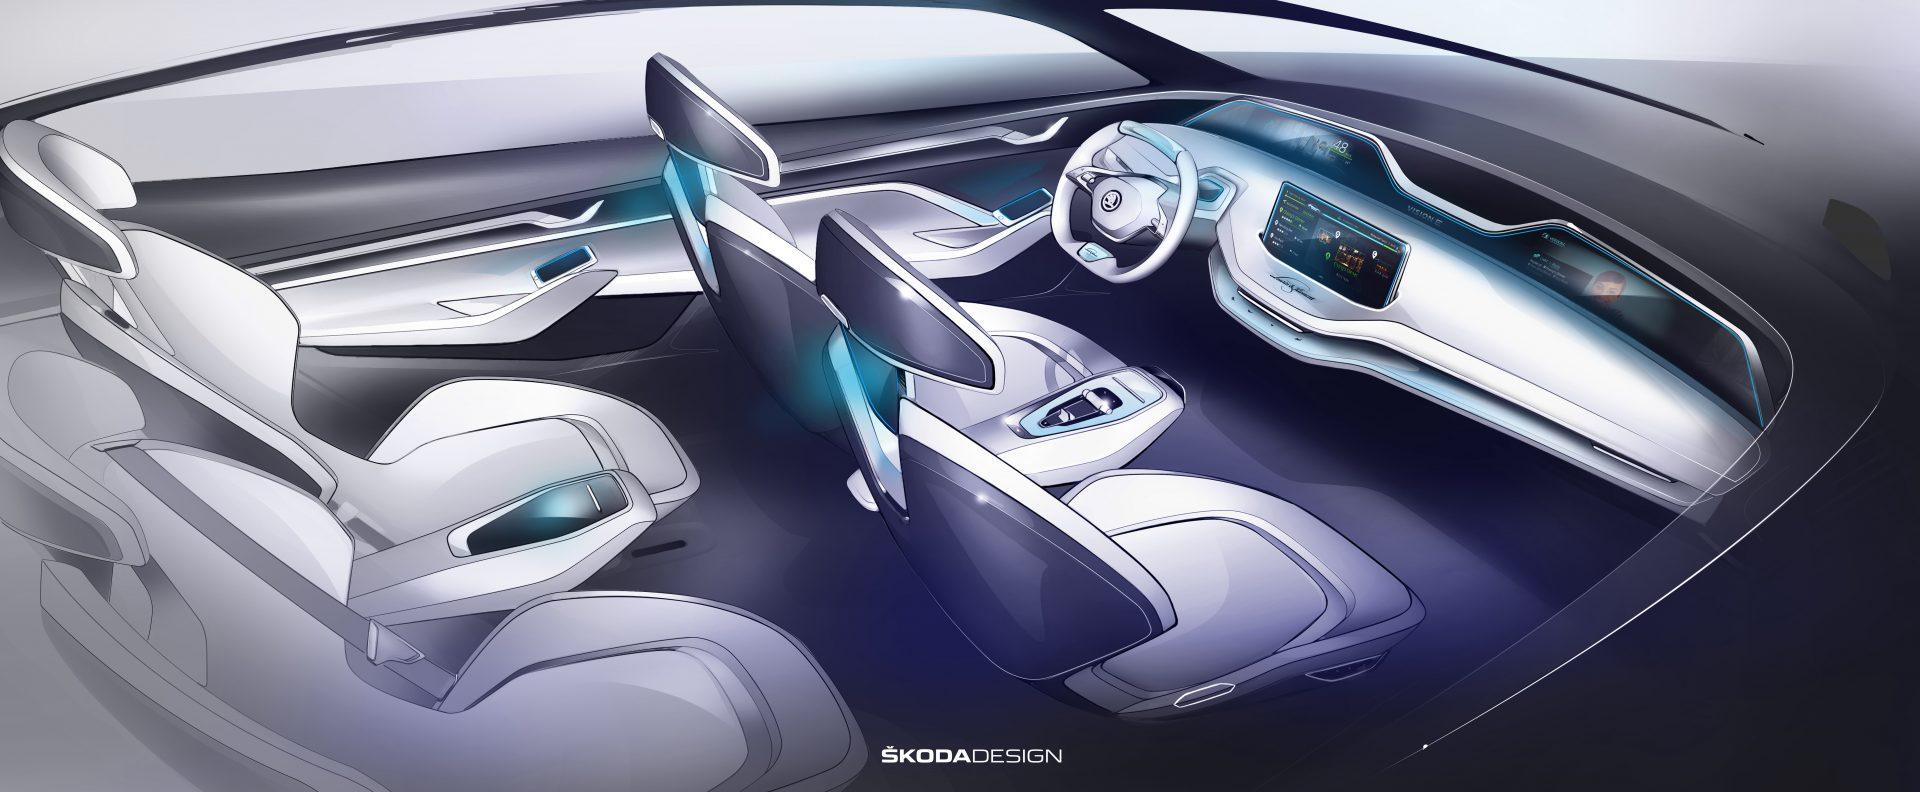 ŠKODA previews interior of VISION E